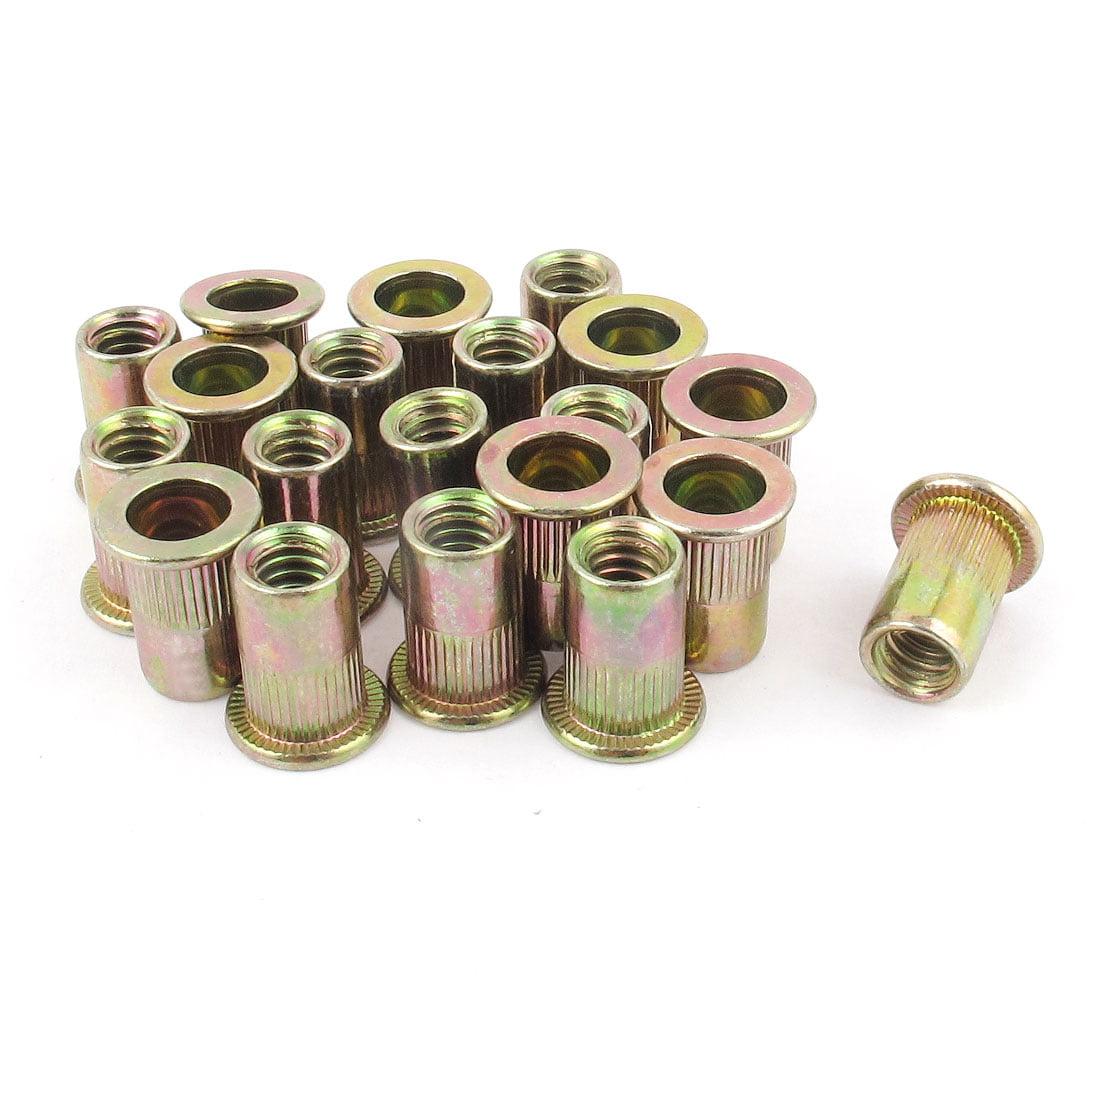 Angelakerry 50pcs M4 Stainless Steel Rivnut Insert Nutsert Flat Head Rivet Nut Threaded Multi